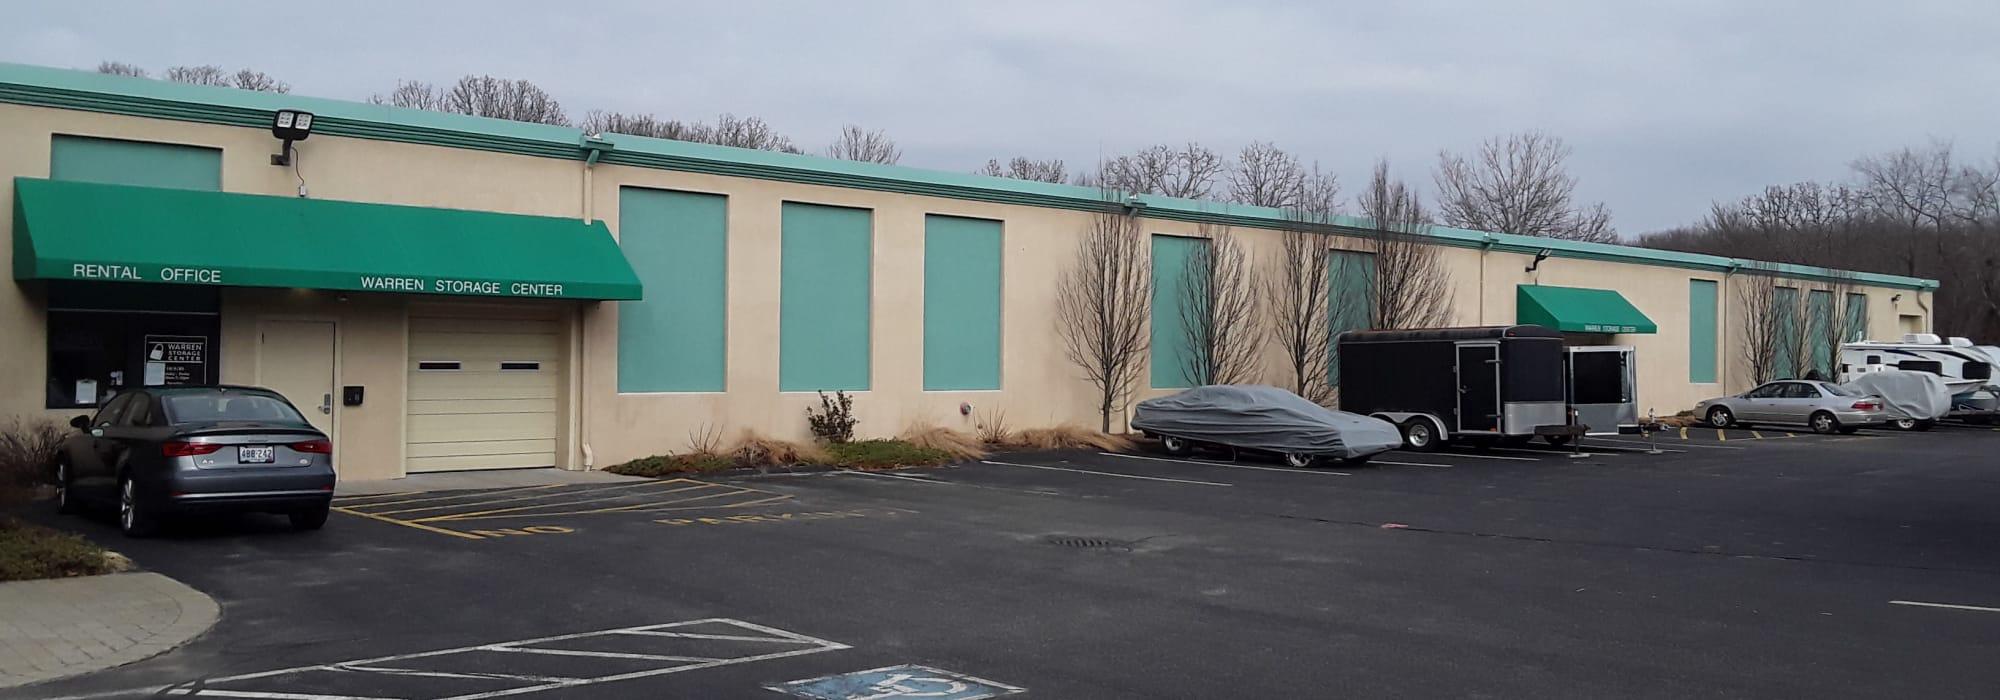 Prime Storage in Warren, RI